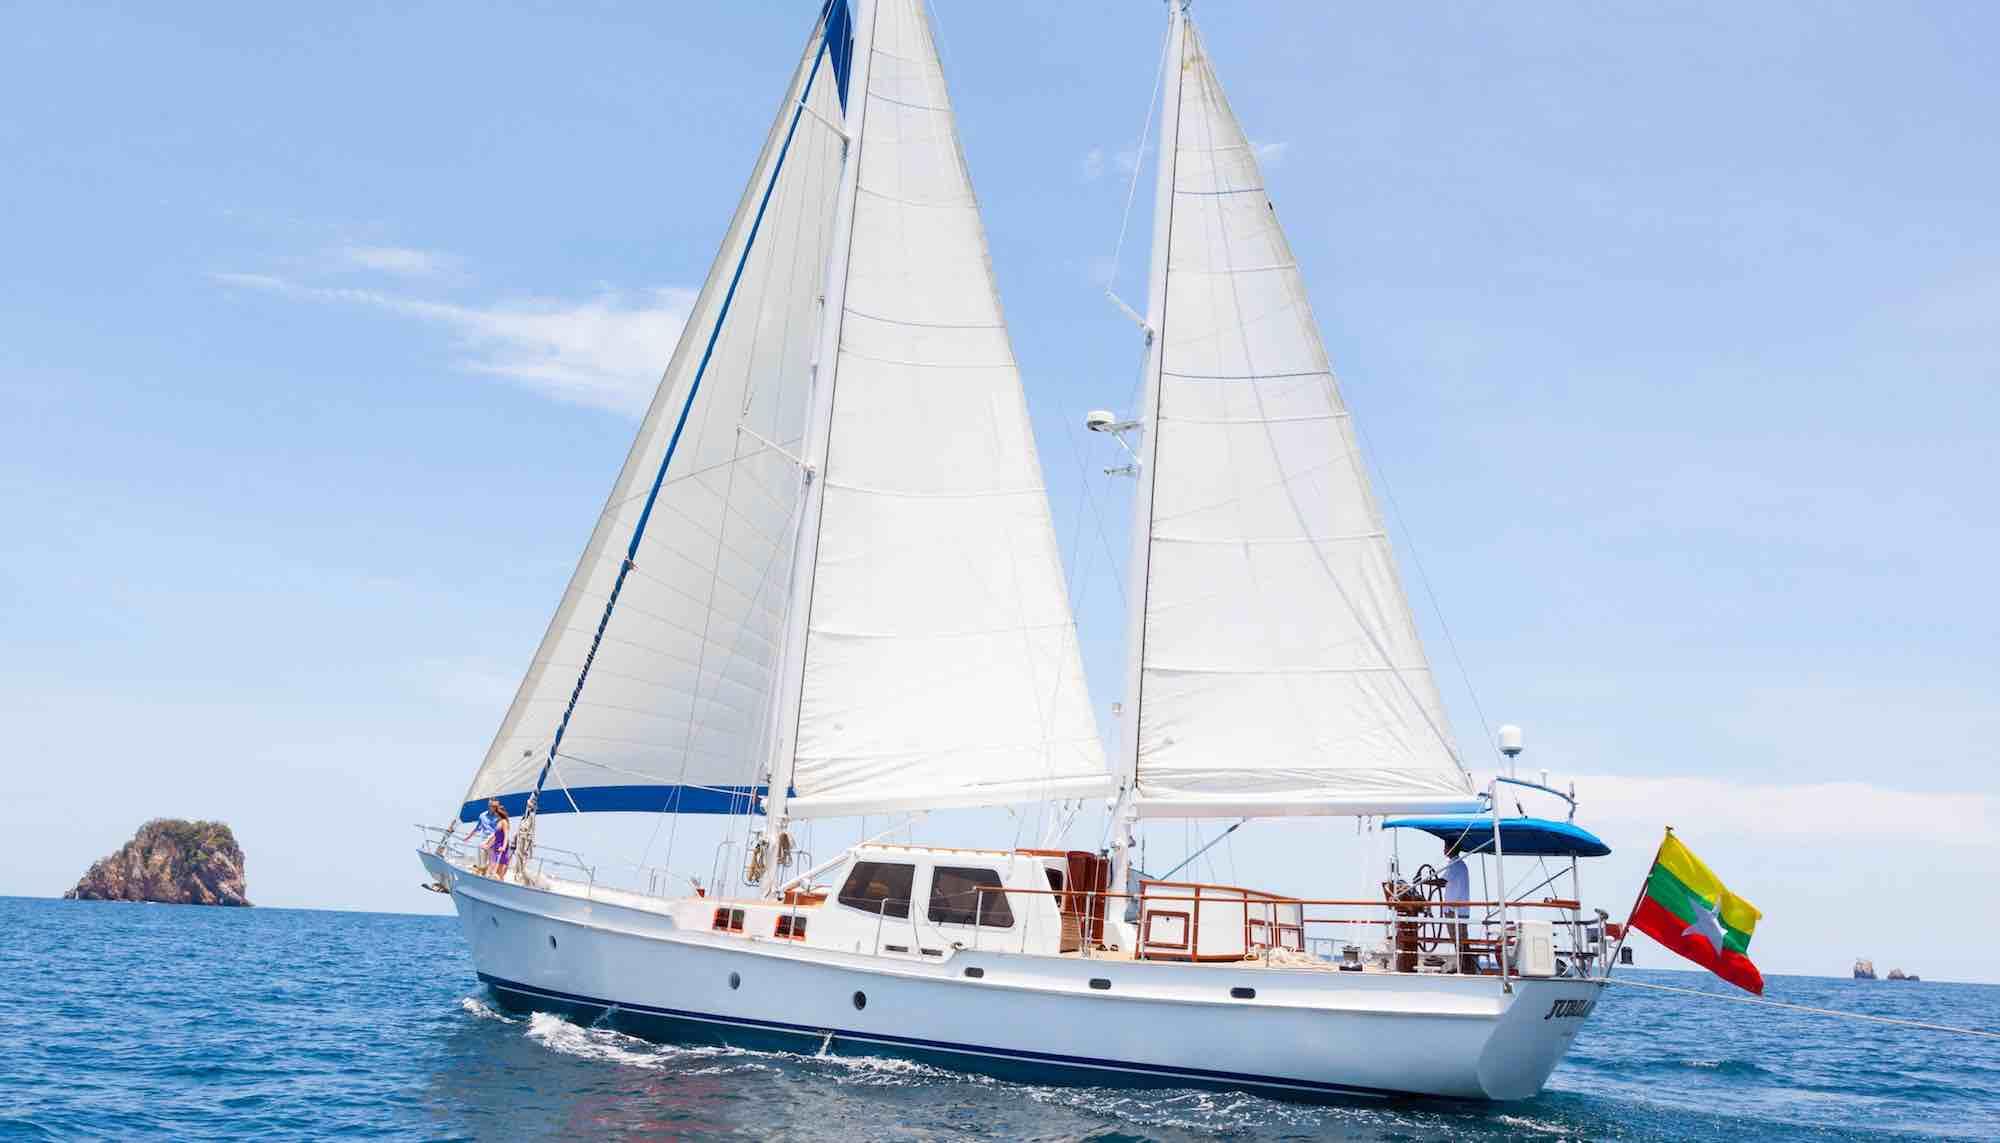 Jubilaeum_closeup of yacht sailing toward an island in Mergui Archipelago_XS.jpeg